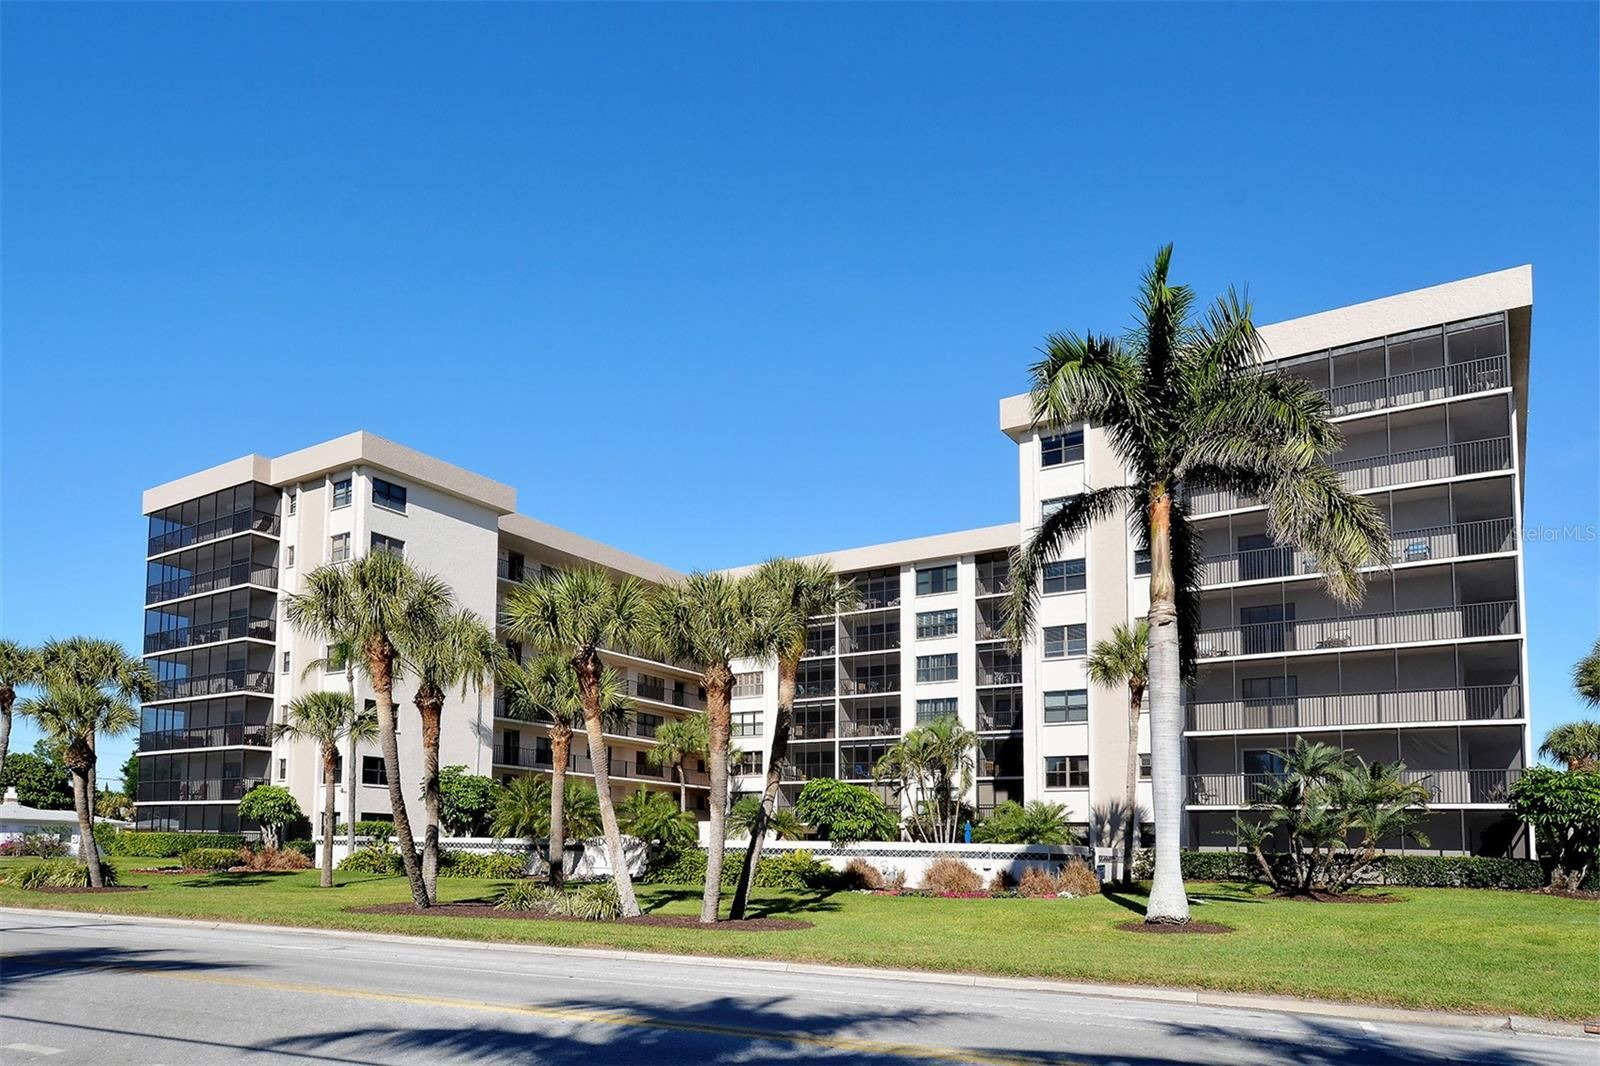 1001 BENJAMIN FRANKLIN DRIVE #313, Sarasota, FL 34236 - #: A4506943